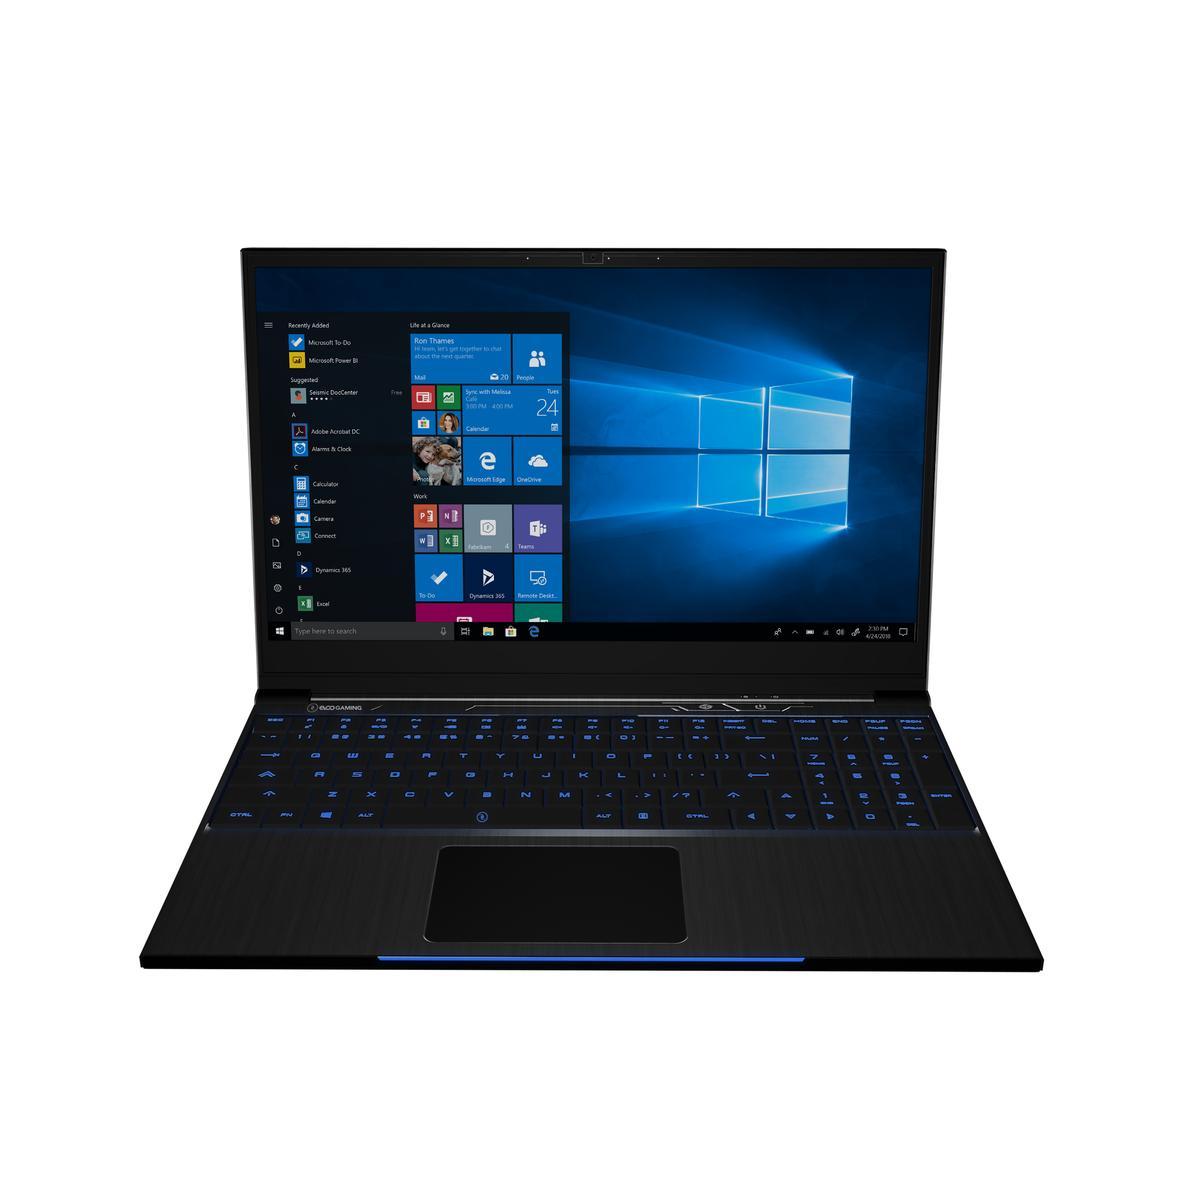 "EVOO GAMING EG-LP5-BK 15.6"" 1920 x 1080 144 Hz Core i7-9750H 2.6 GHz 16 GB Memory 512 GB Storage Laptop"